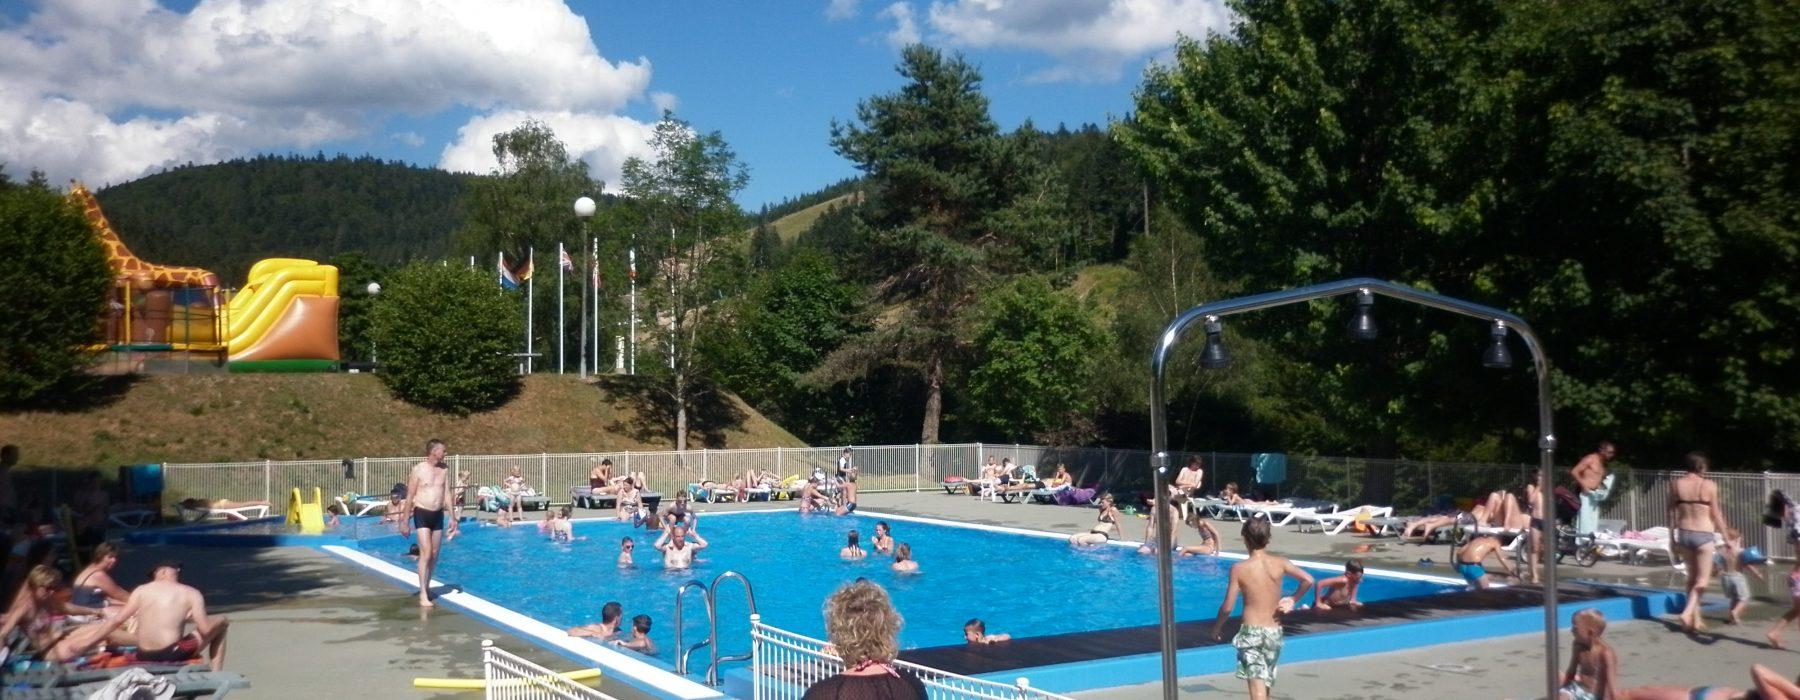 Swimming Pool Area   Camping Belle Hutte destiné Camping Gérardmer Avec Piscine